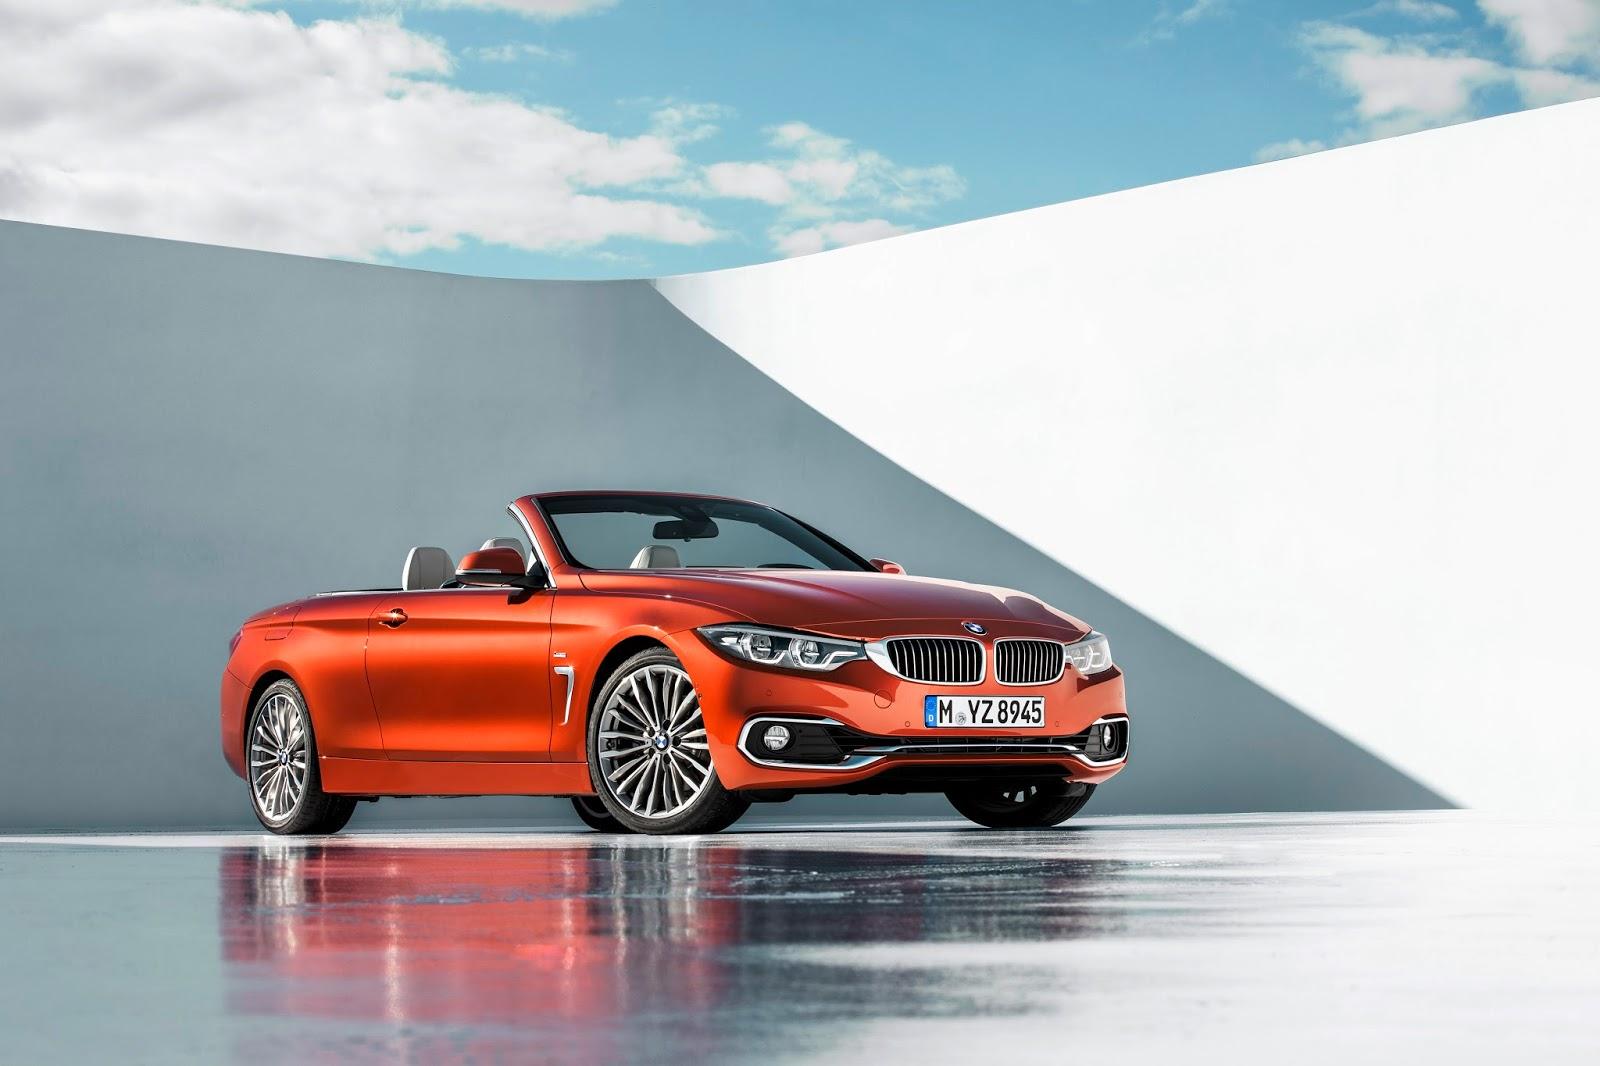 P90245259 highRes bmw 4 series luxury Η νέα BMW Σειρά 4, με πιο σφιχτή ρύθμιση ανάρτησης BMW, Bmw 4, BMW 4 Cabrio, BMW 4 Coupe, BMW 4 Gran Coupé, Facelift